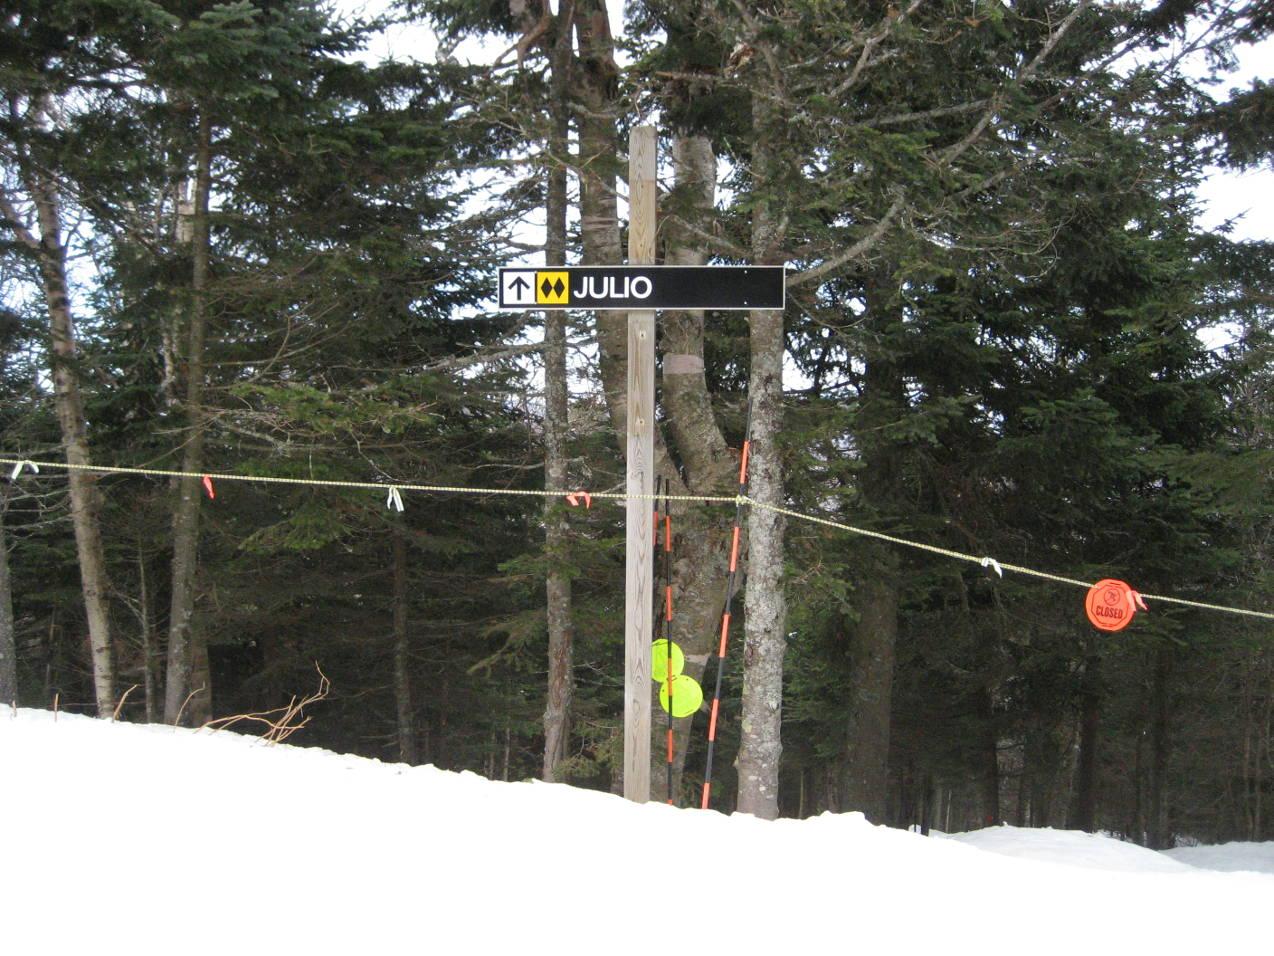 Killington Vermont (US) Ski Resort Review and Guide